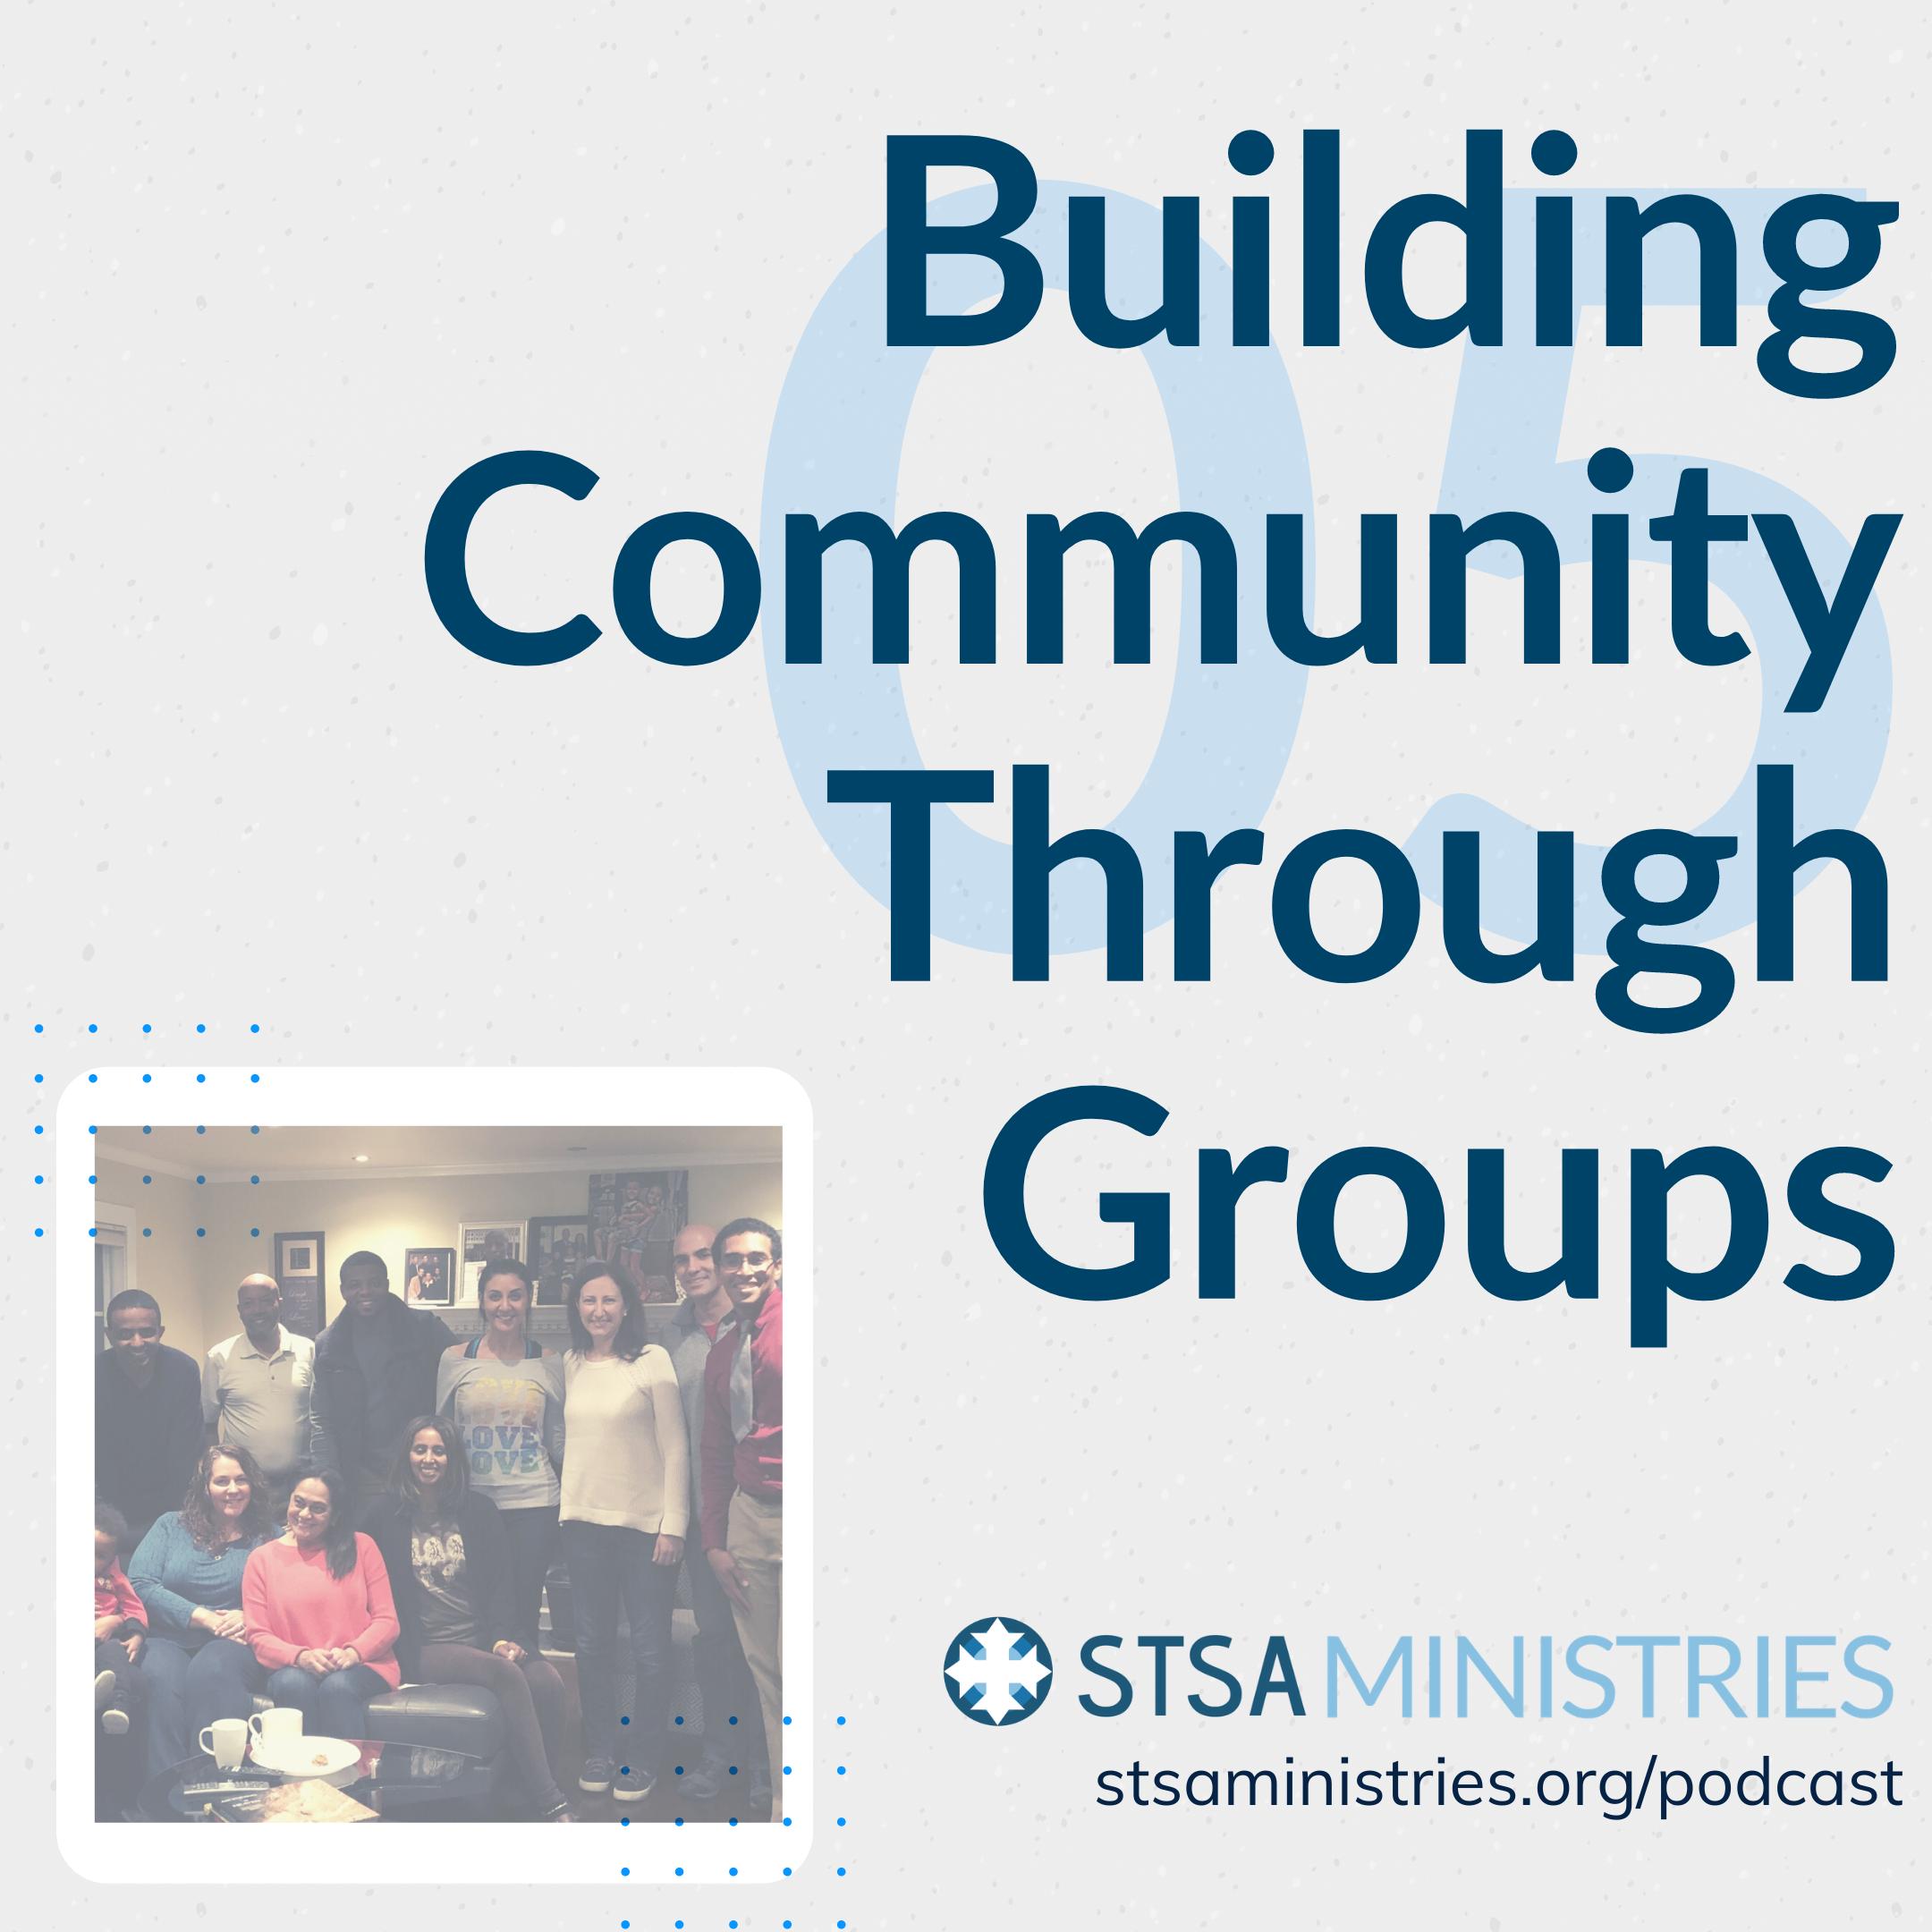 Building Community Through Groups